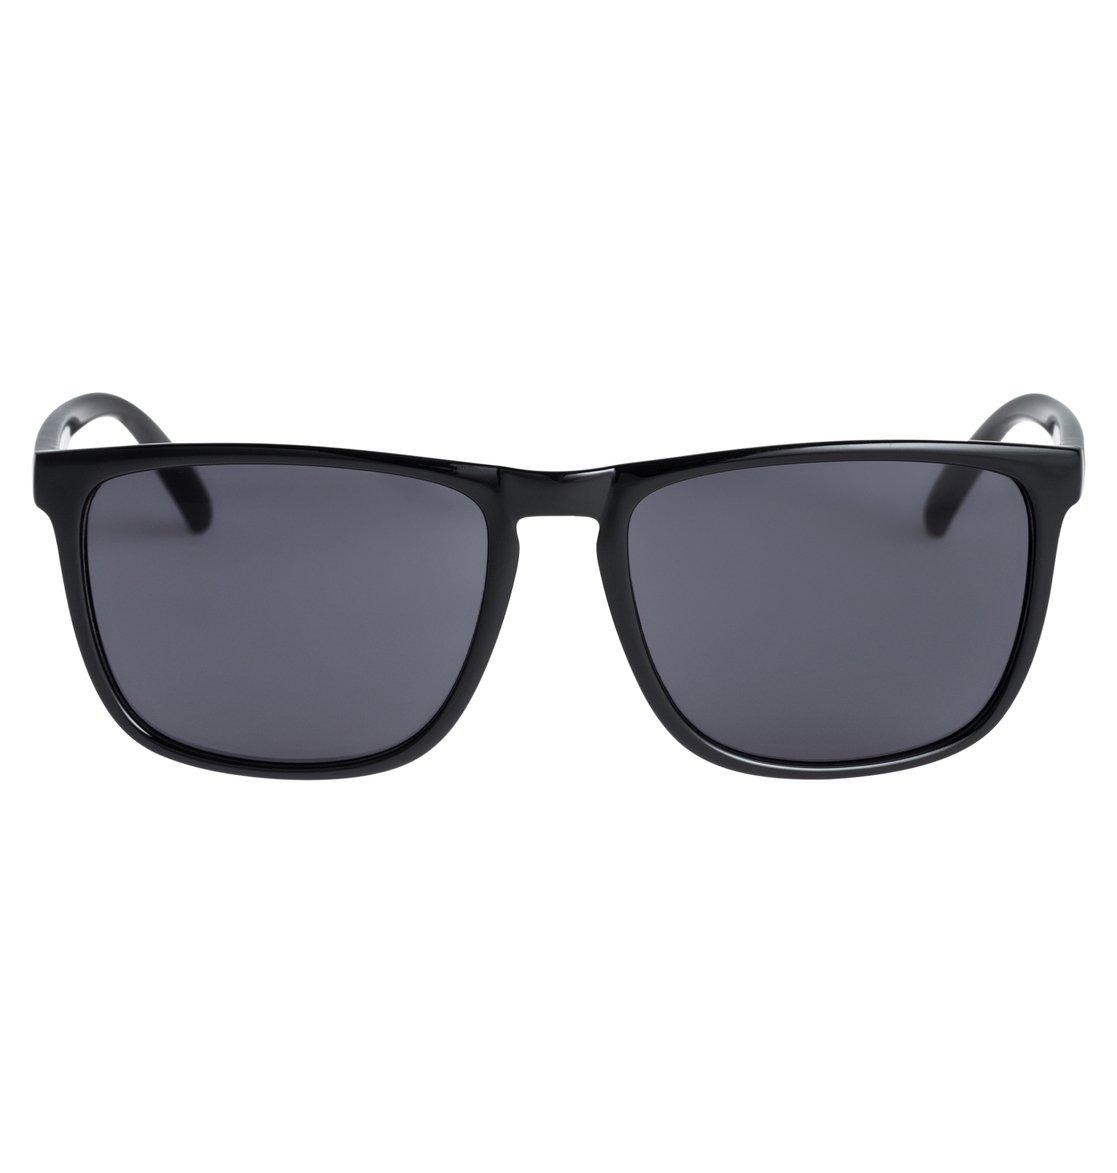 d2d07ebe3b Gafas Shades Edyey03003Shoes Hombre Sol Para Dc De QrdWCBxoe